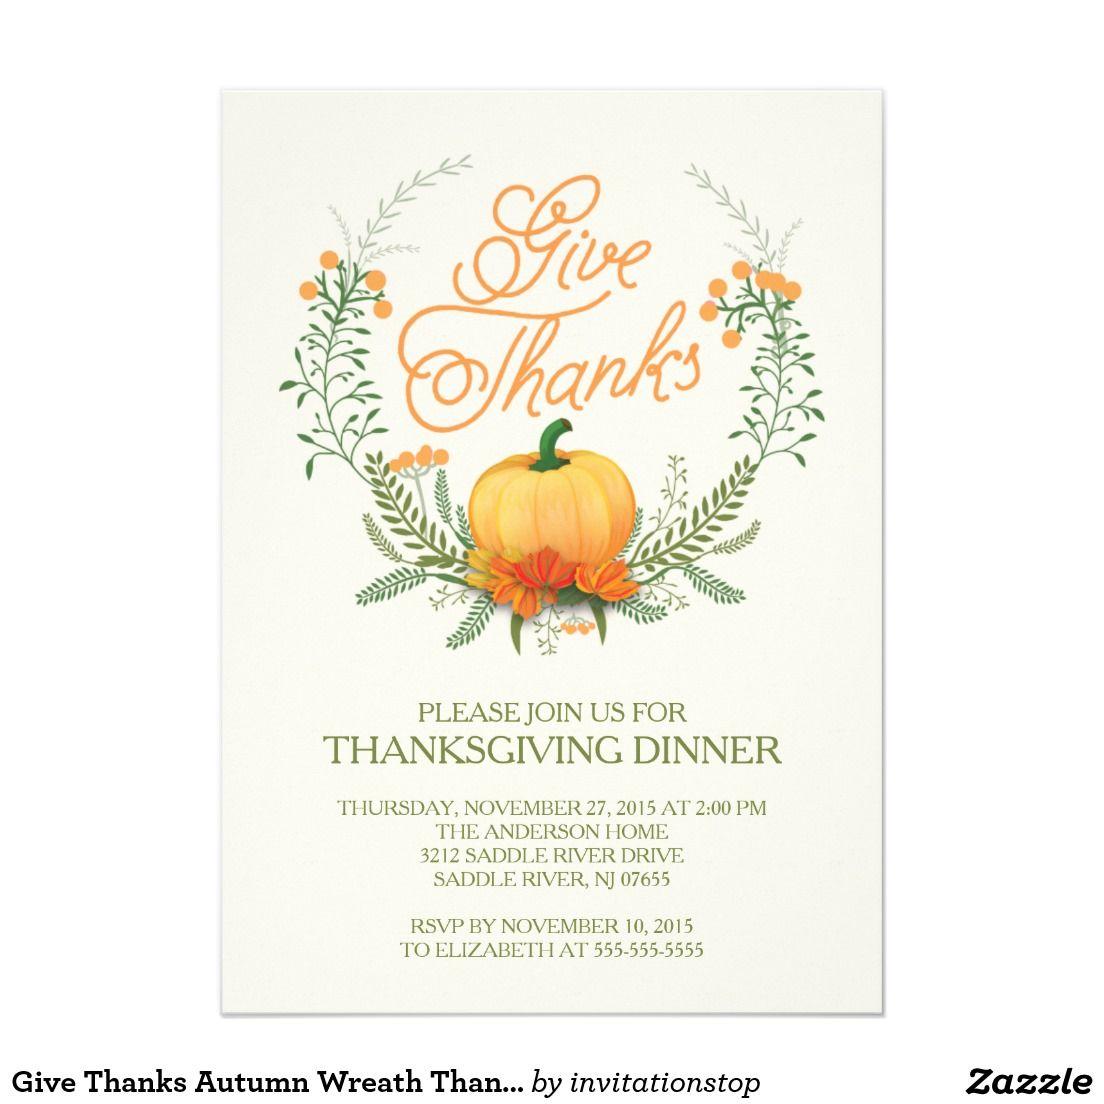 Give Thanks Autumn Wreath Thanksgiving Invitation Zazzle Com In 2020 Thanksgiving Invitation Thanksgiving Wreaths Thanksgiving School Party